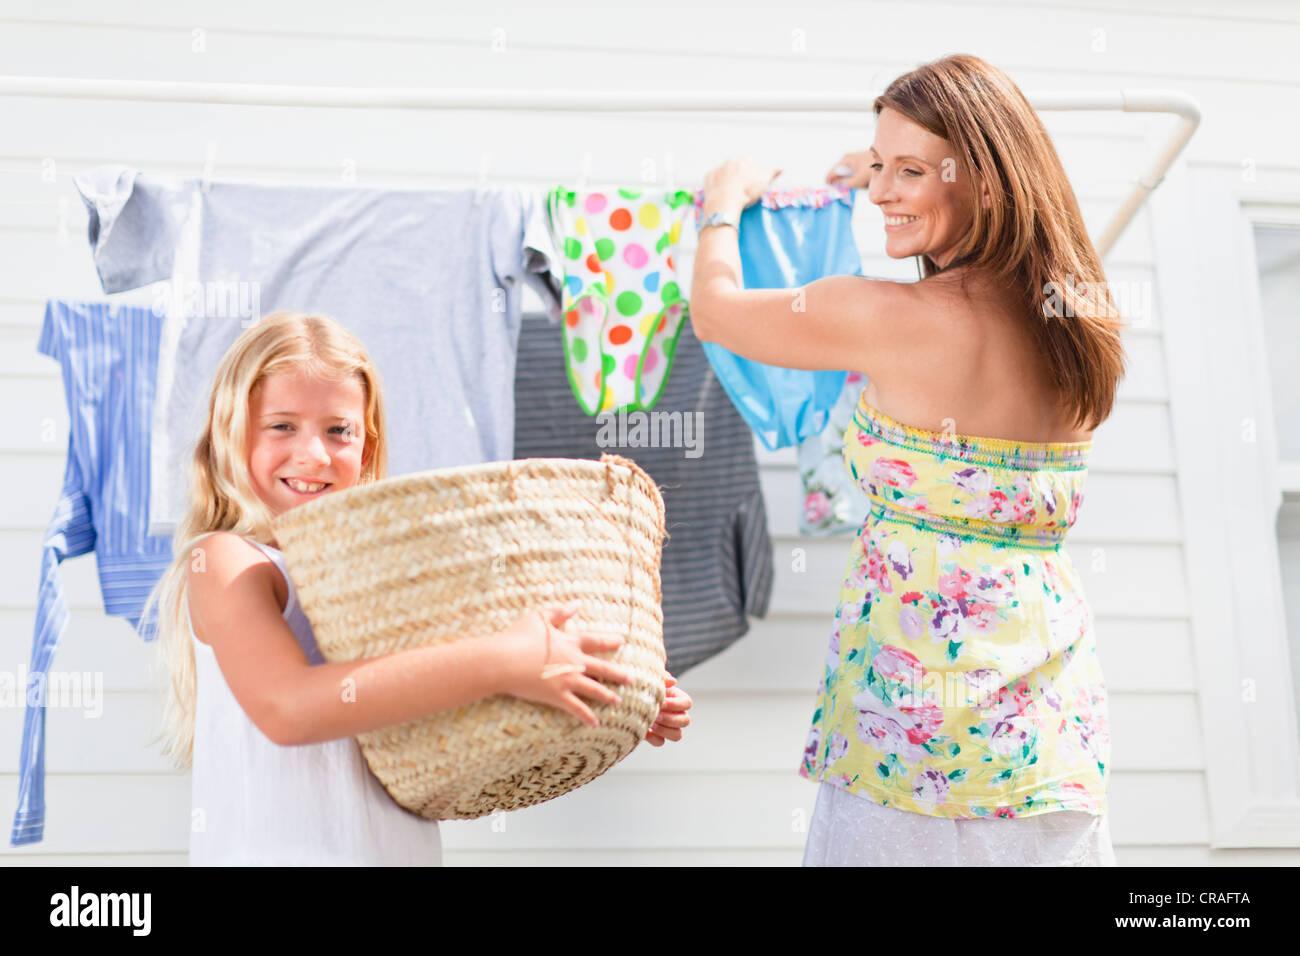 Mädchen helfen Mutter hängen Wäsche Stockbild